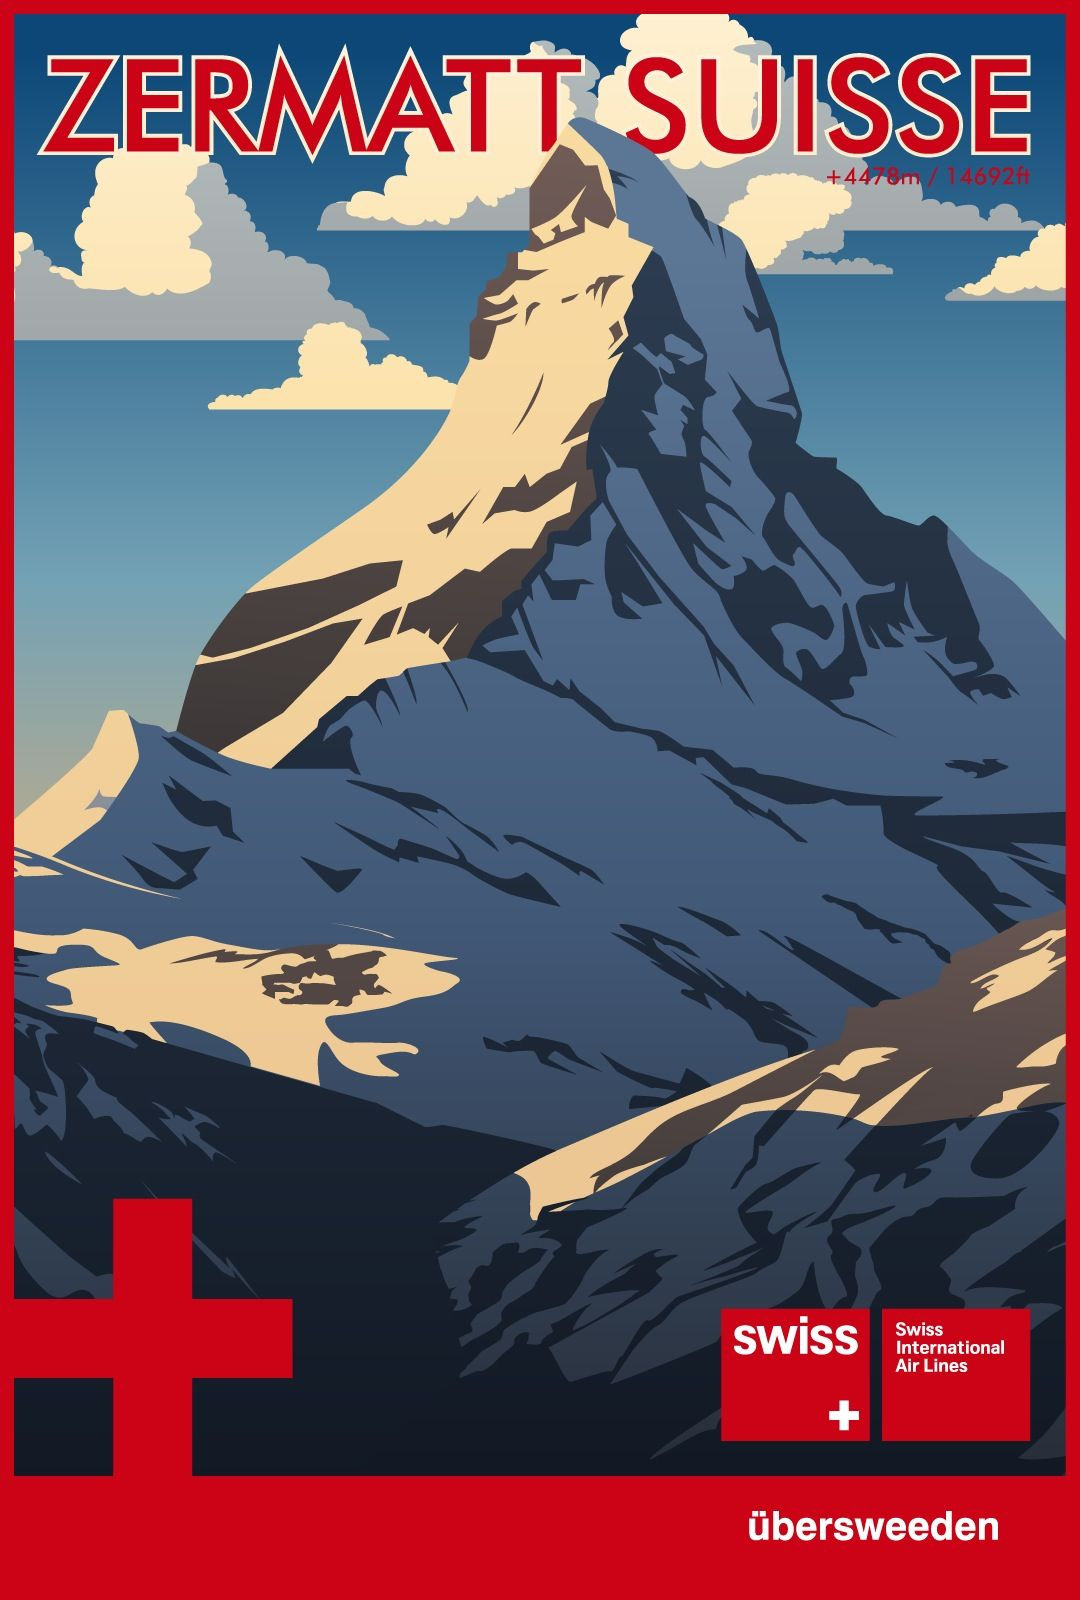 Zermatt Switzerland The Matterhorn Travel Poster Travel Posters Vintage Ski Posters Ski Posters